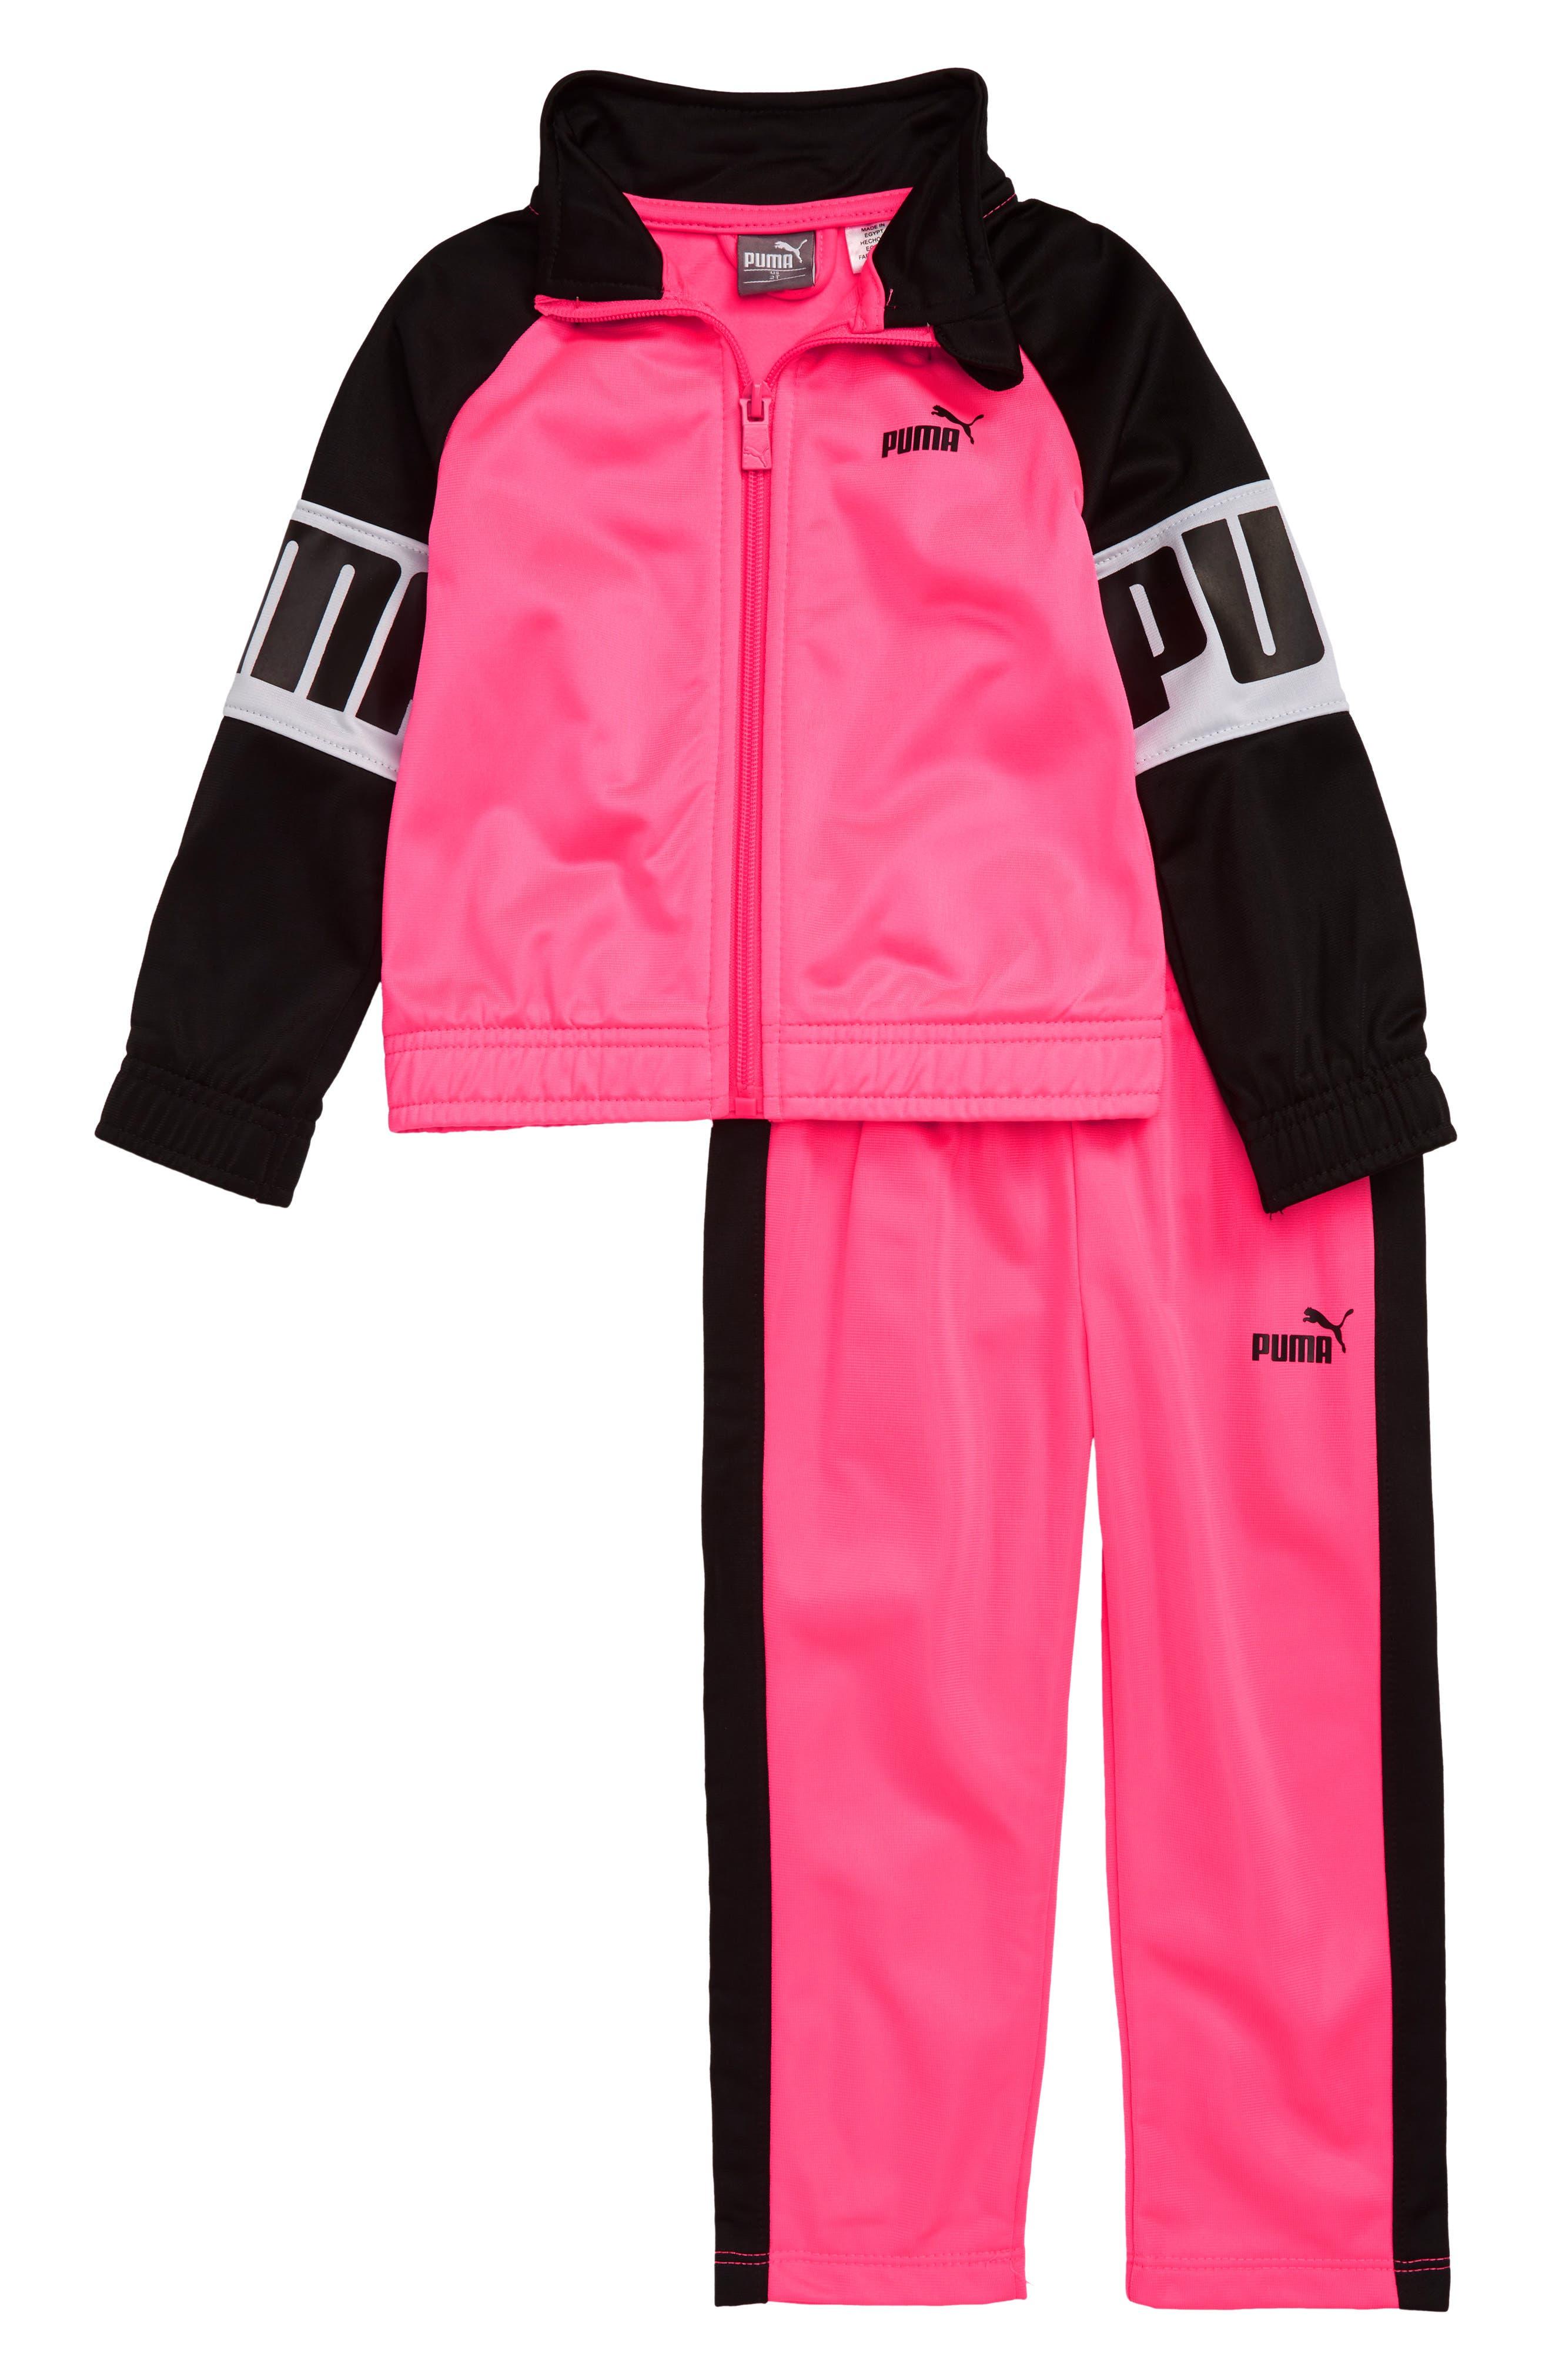 Toddler Girls Puma Track Jacket  Track Pants Set